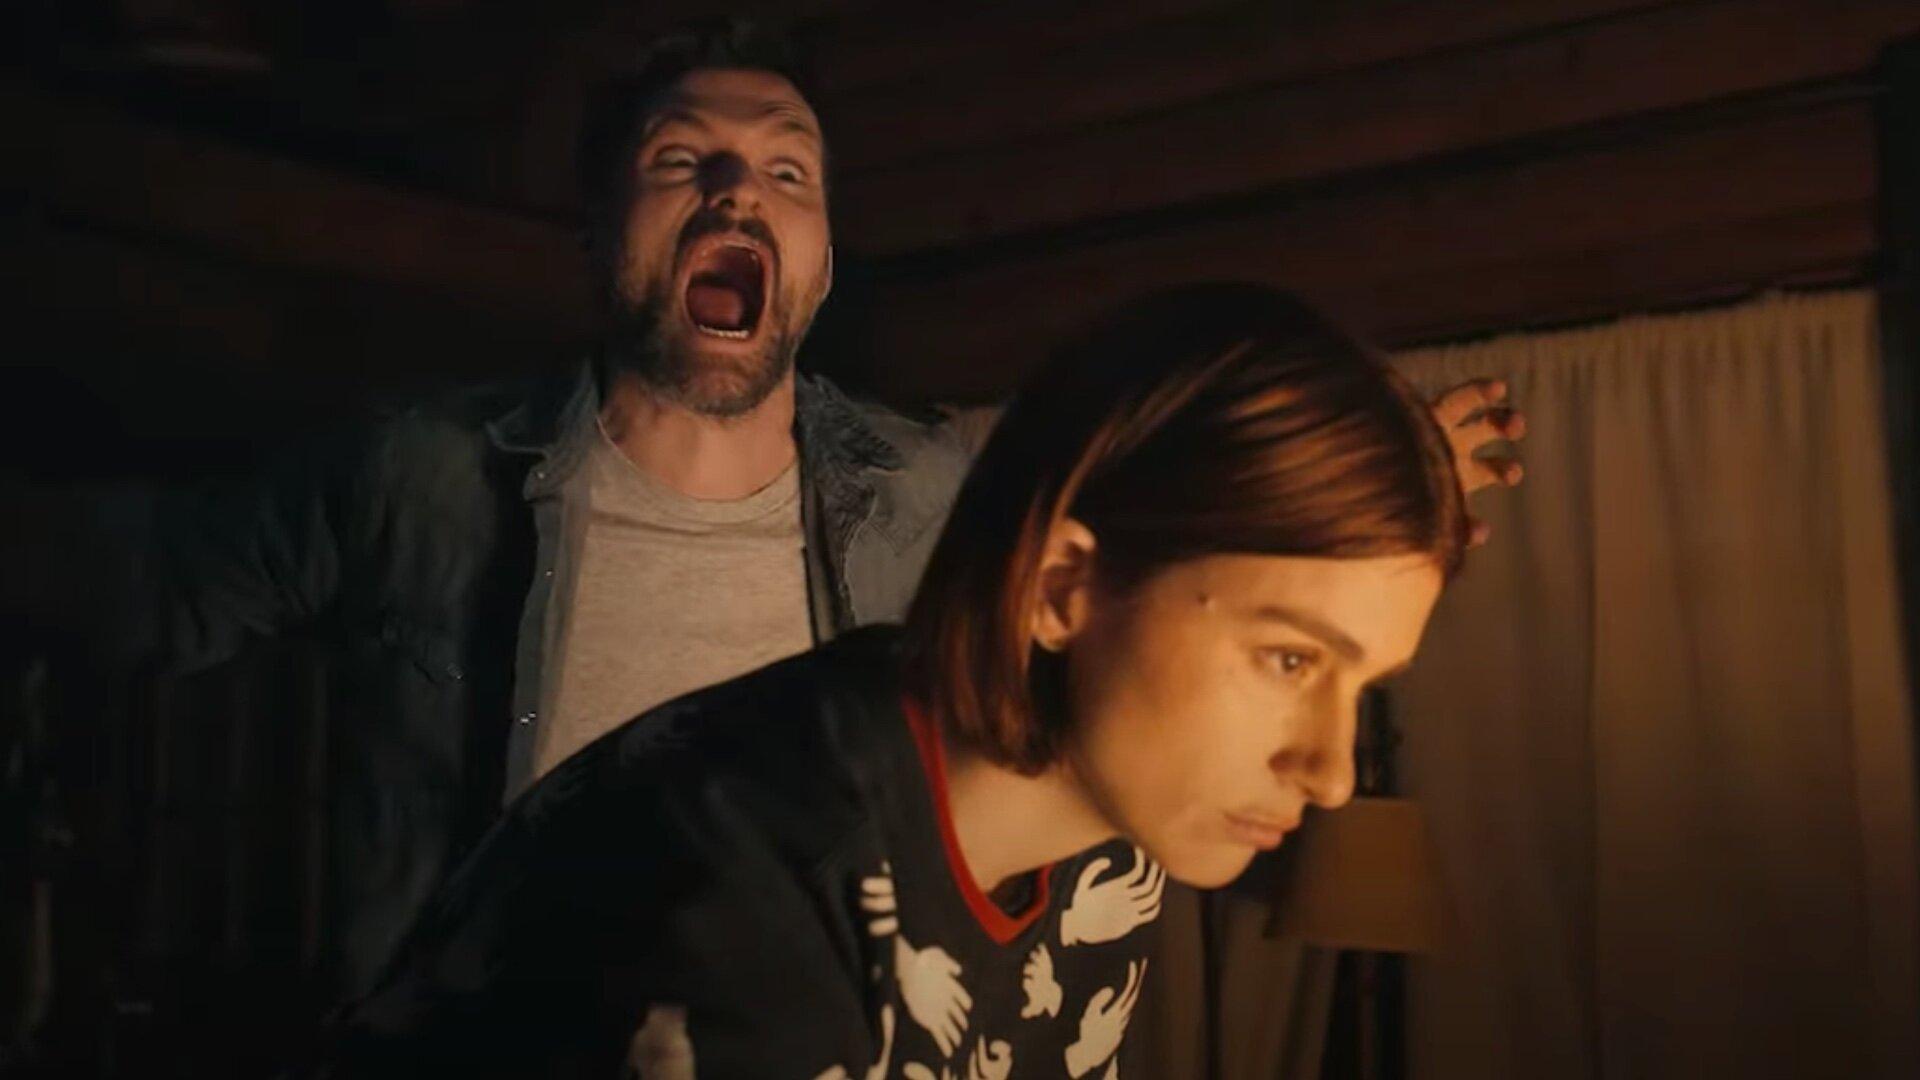 Trailer for The Fantastically Fun Horror Comedy SCARE ME